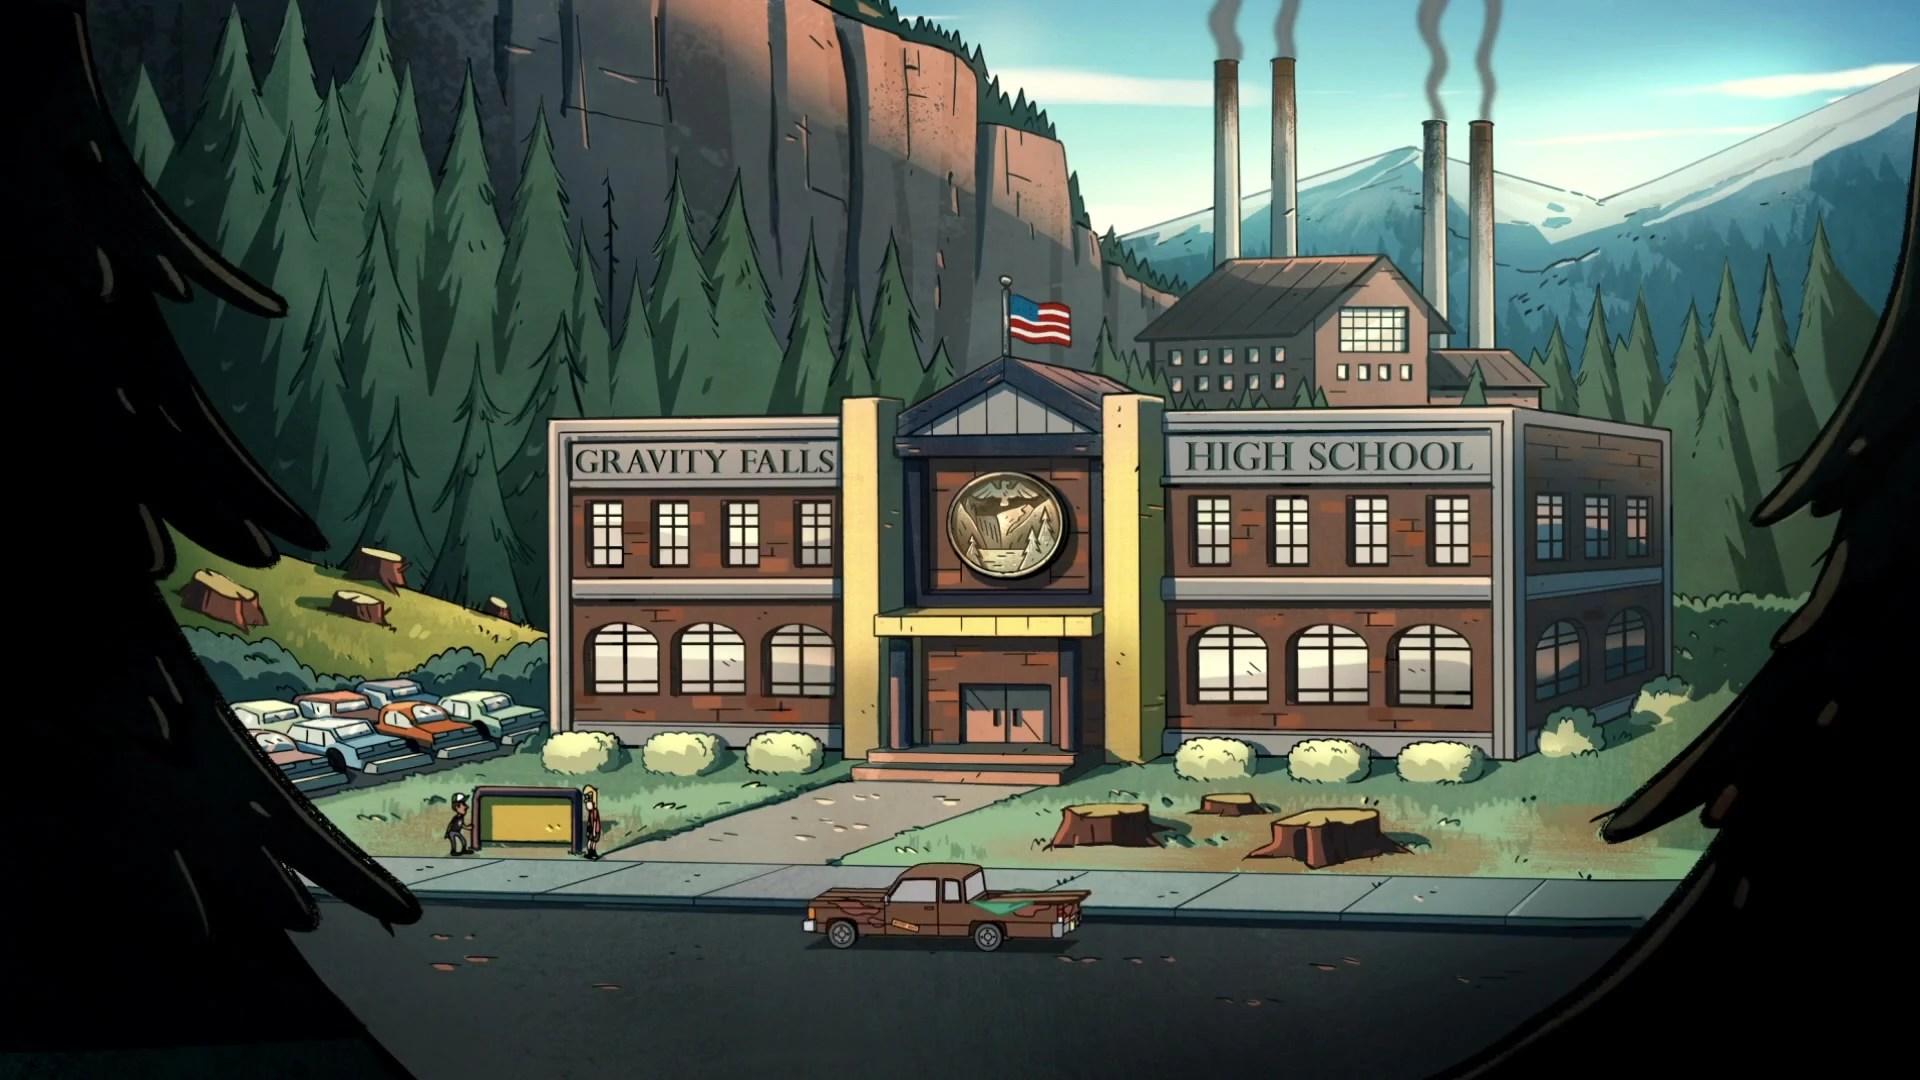 Gravity Falls Mabel And Waddles Wallpaper Gravity Falls High School Gravity Falls Wiki Fandom